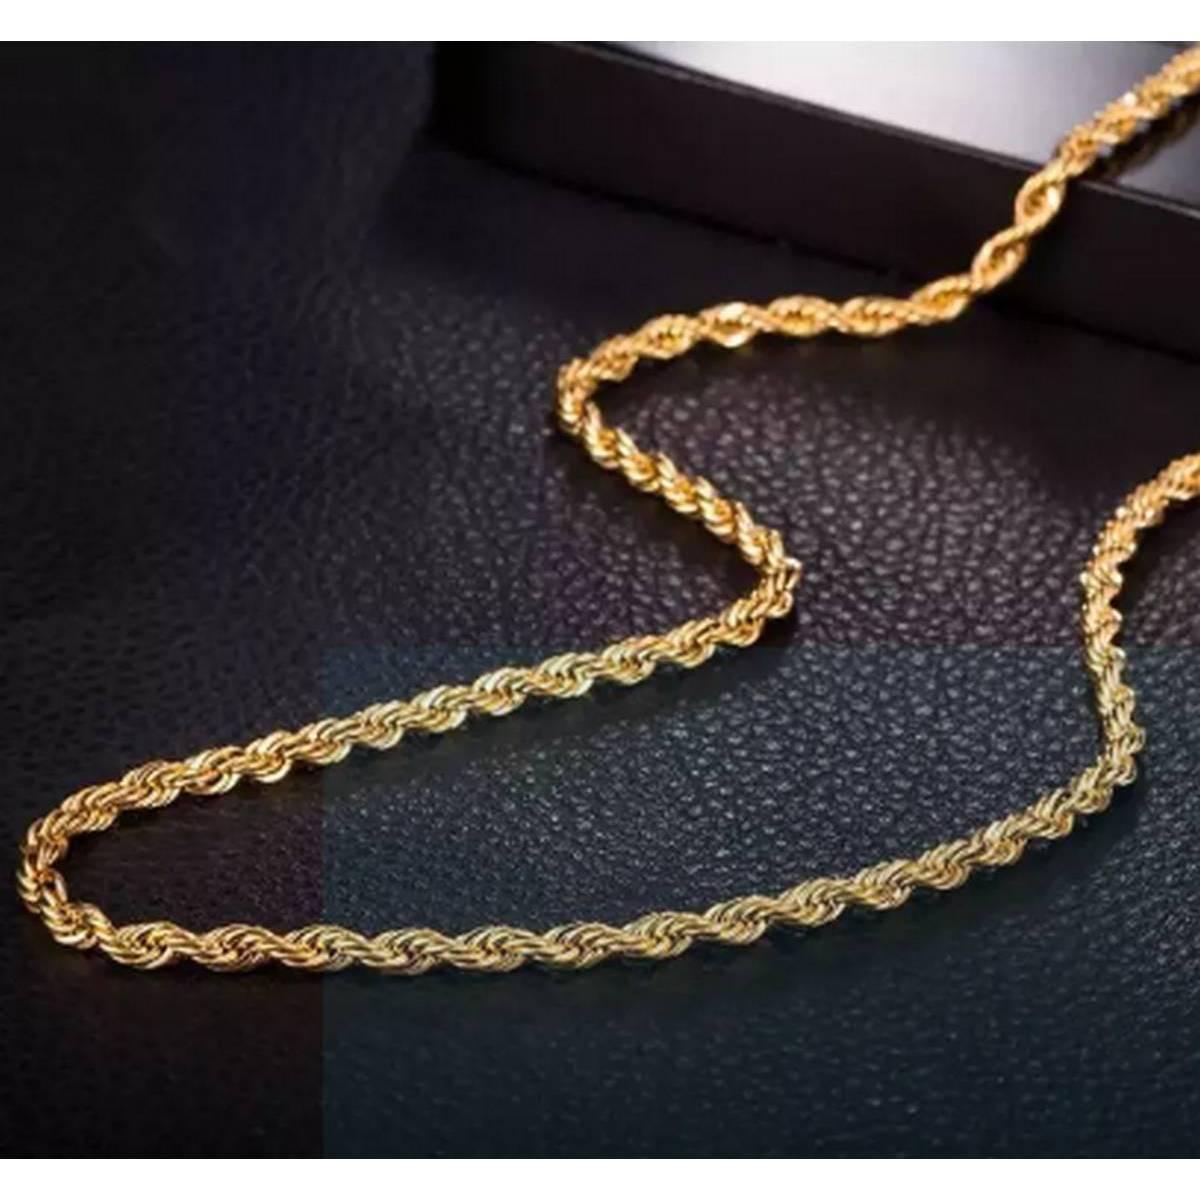 Italian Rope Design Neck Chain For Men – Gold Plated